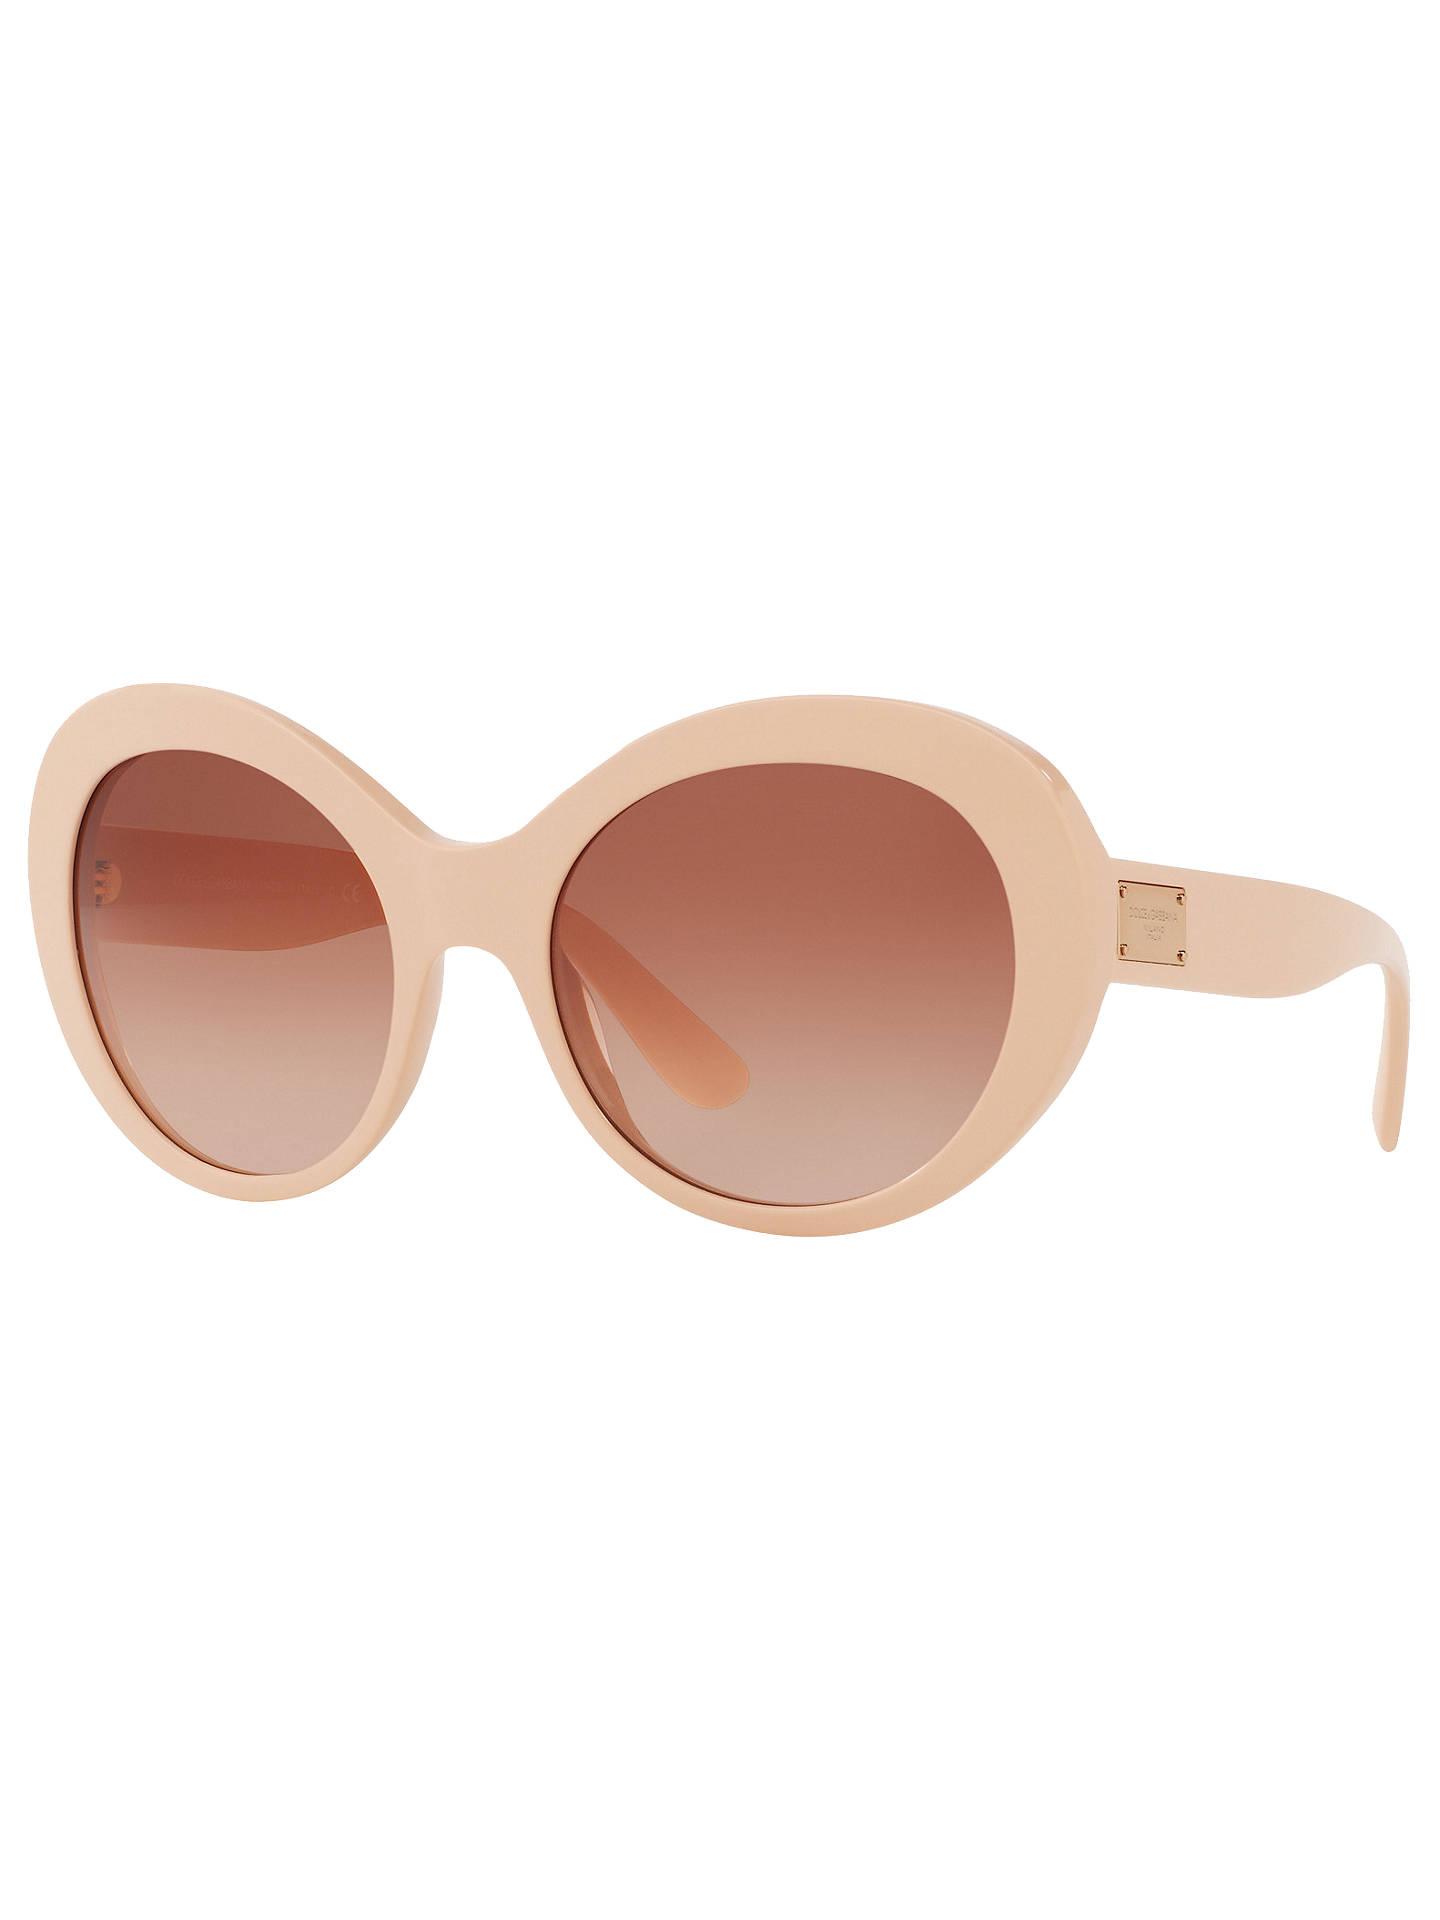 e0e7963857 BuyDolce   Gabbana DG4295 Outsize Oval Sunglasses